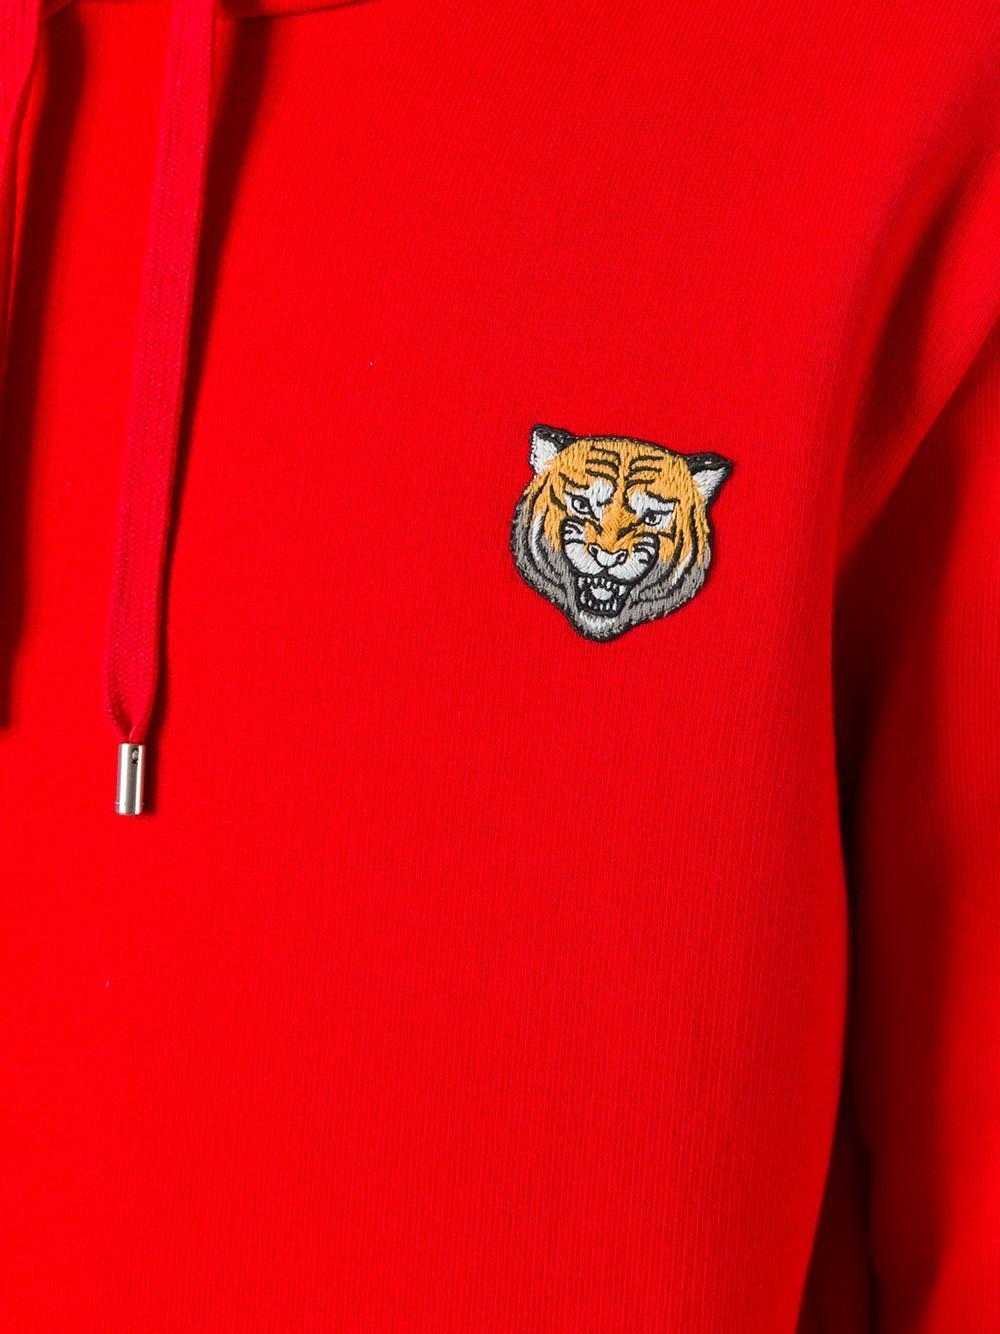 d7e5e9c48dac Gucci Tiger Applique Hoodie in Red for Men - Lyst